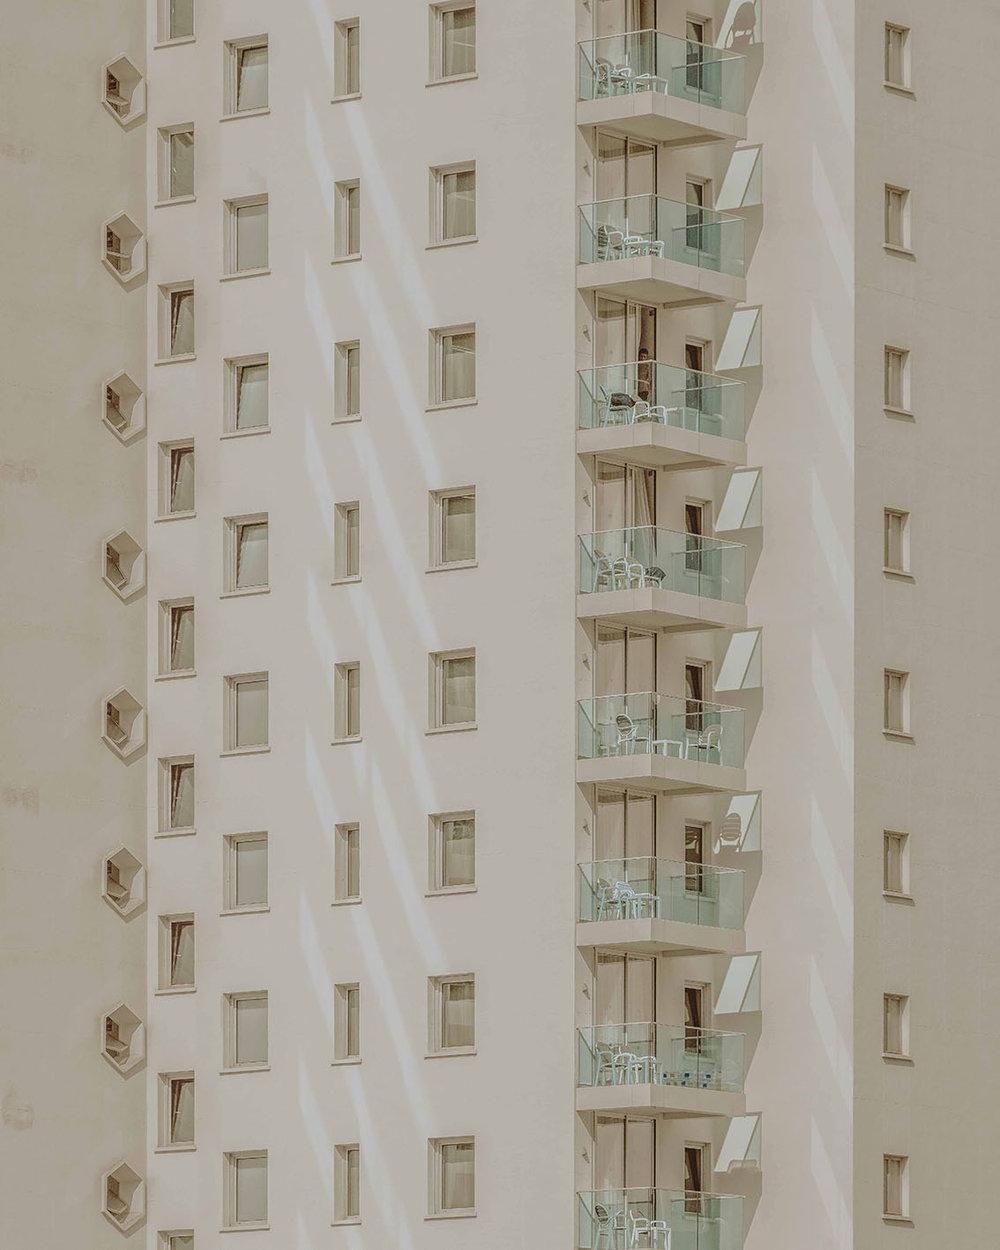 yosigo_arquitectura1.jpg